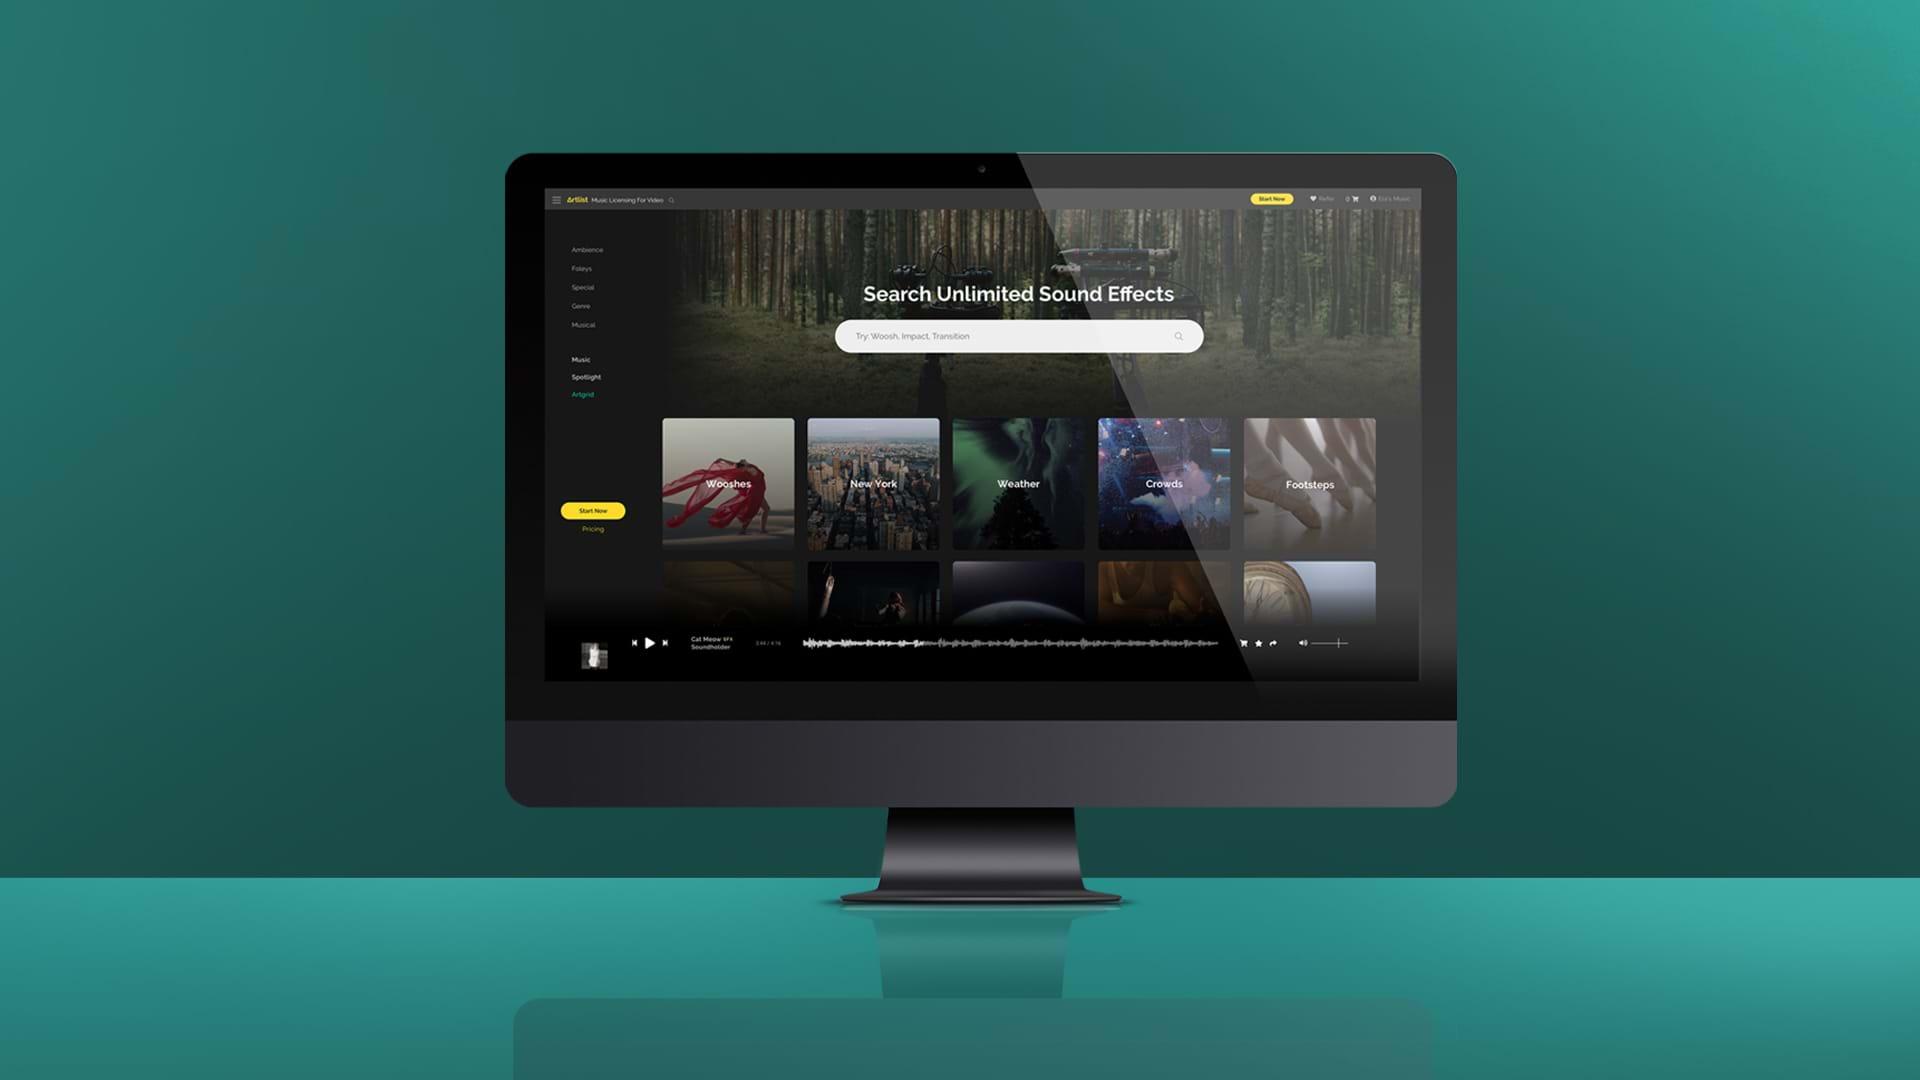 Artlist Launches Anticipated Sound Effects | Artlist